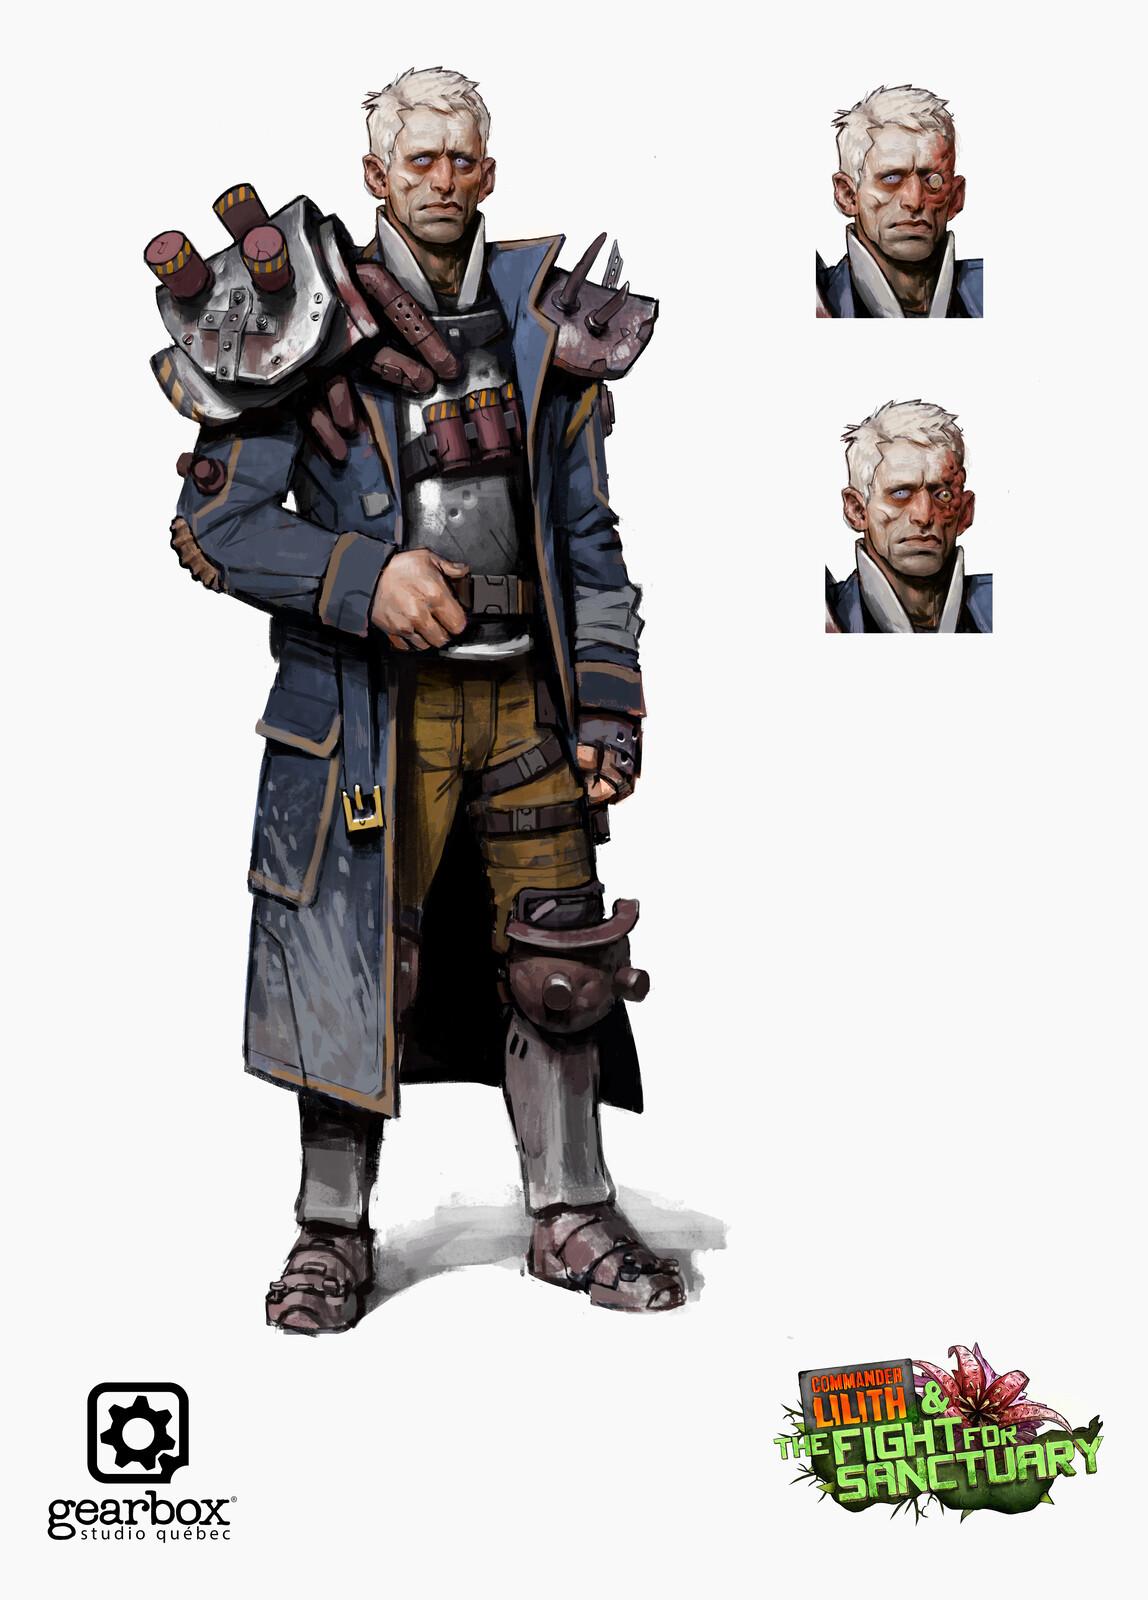 Colonel Hector